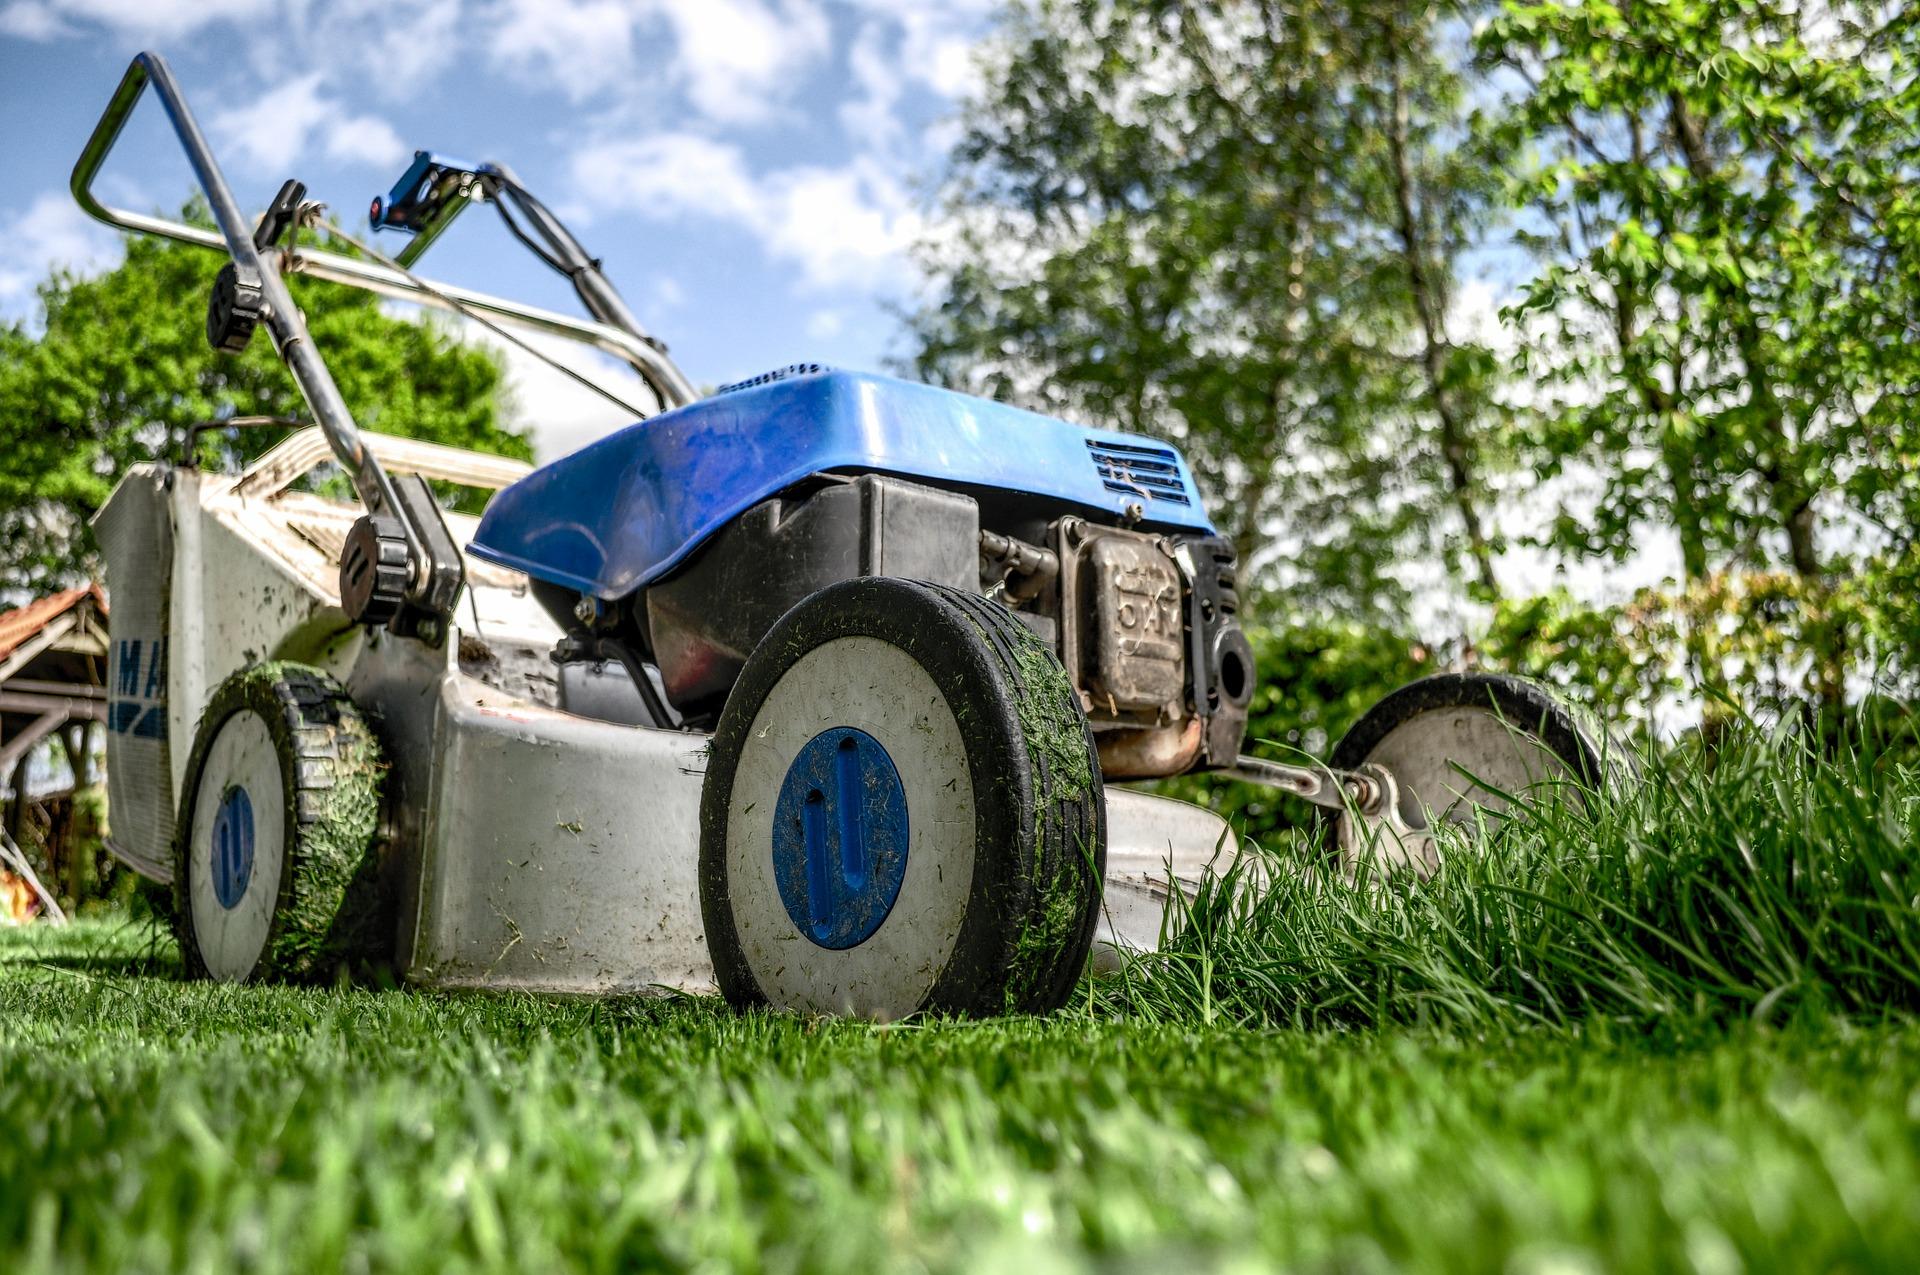 Lawn & Garden Equipment & Supplies - Rental